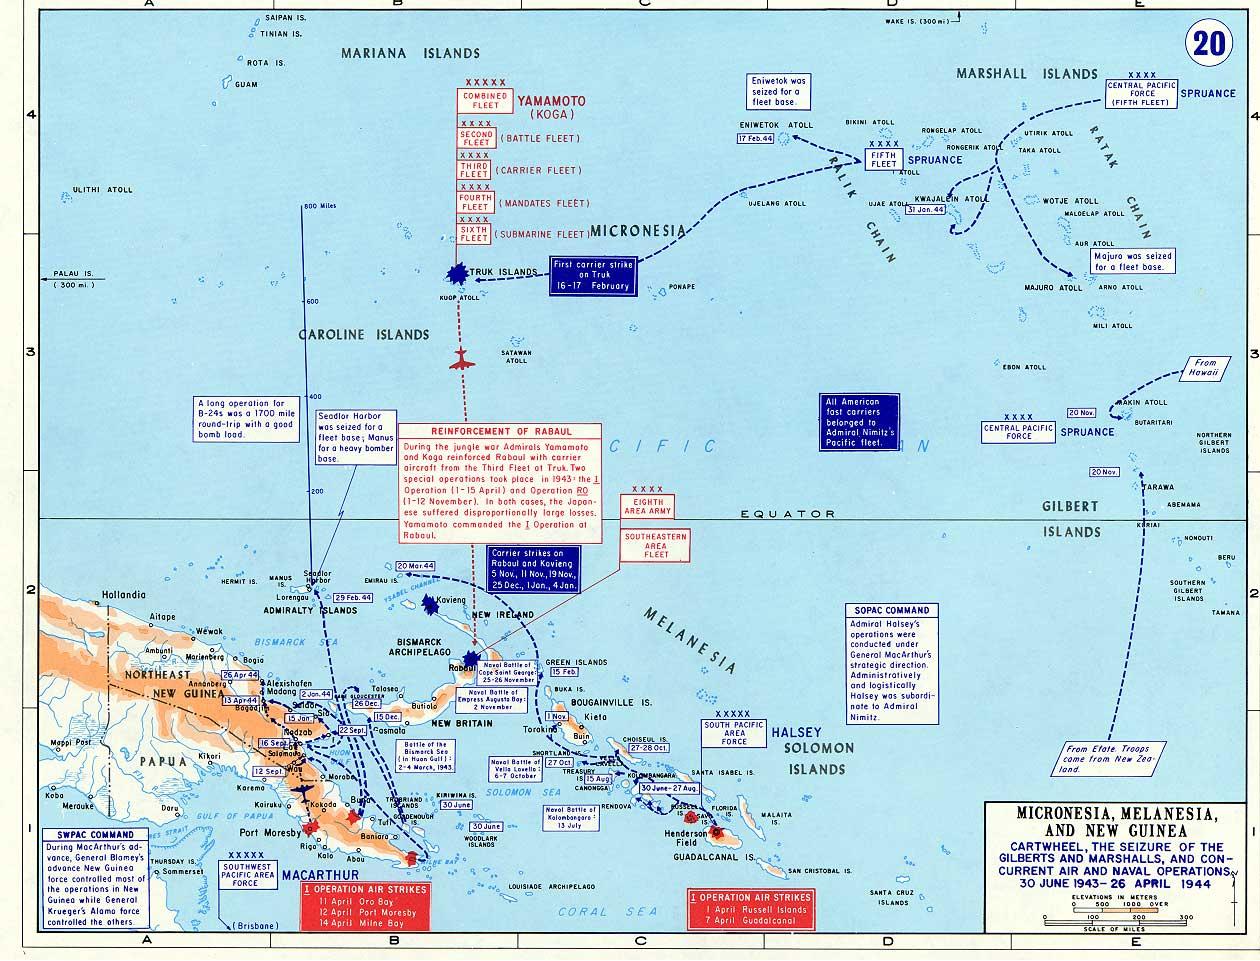 A Map WWII showing Operation Cartwheel Jun 1943 to Apr 1944